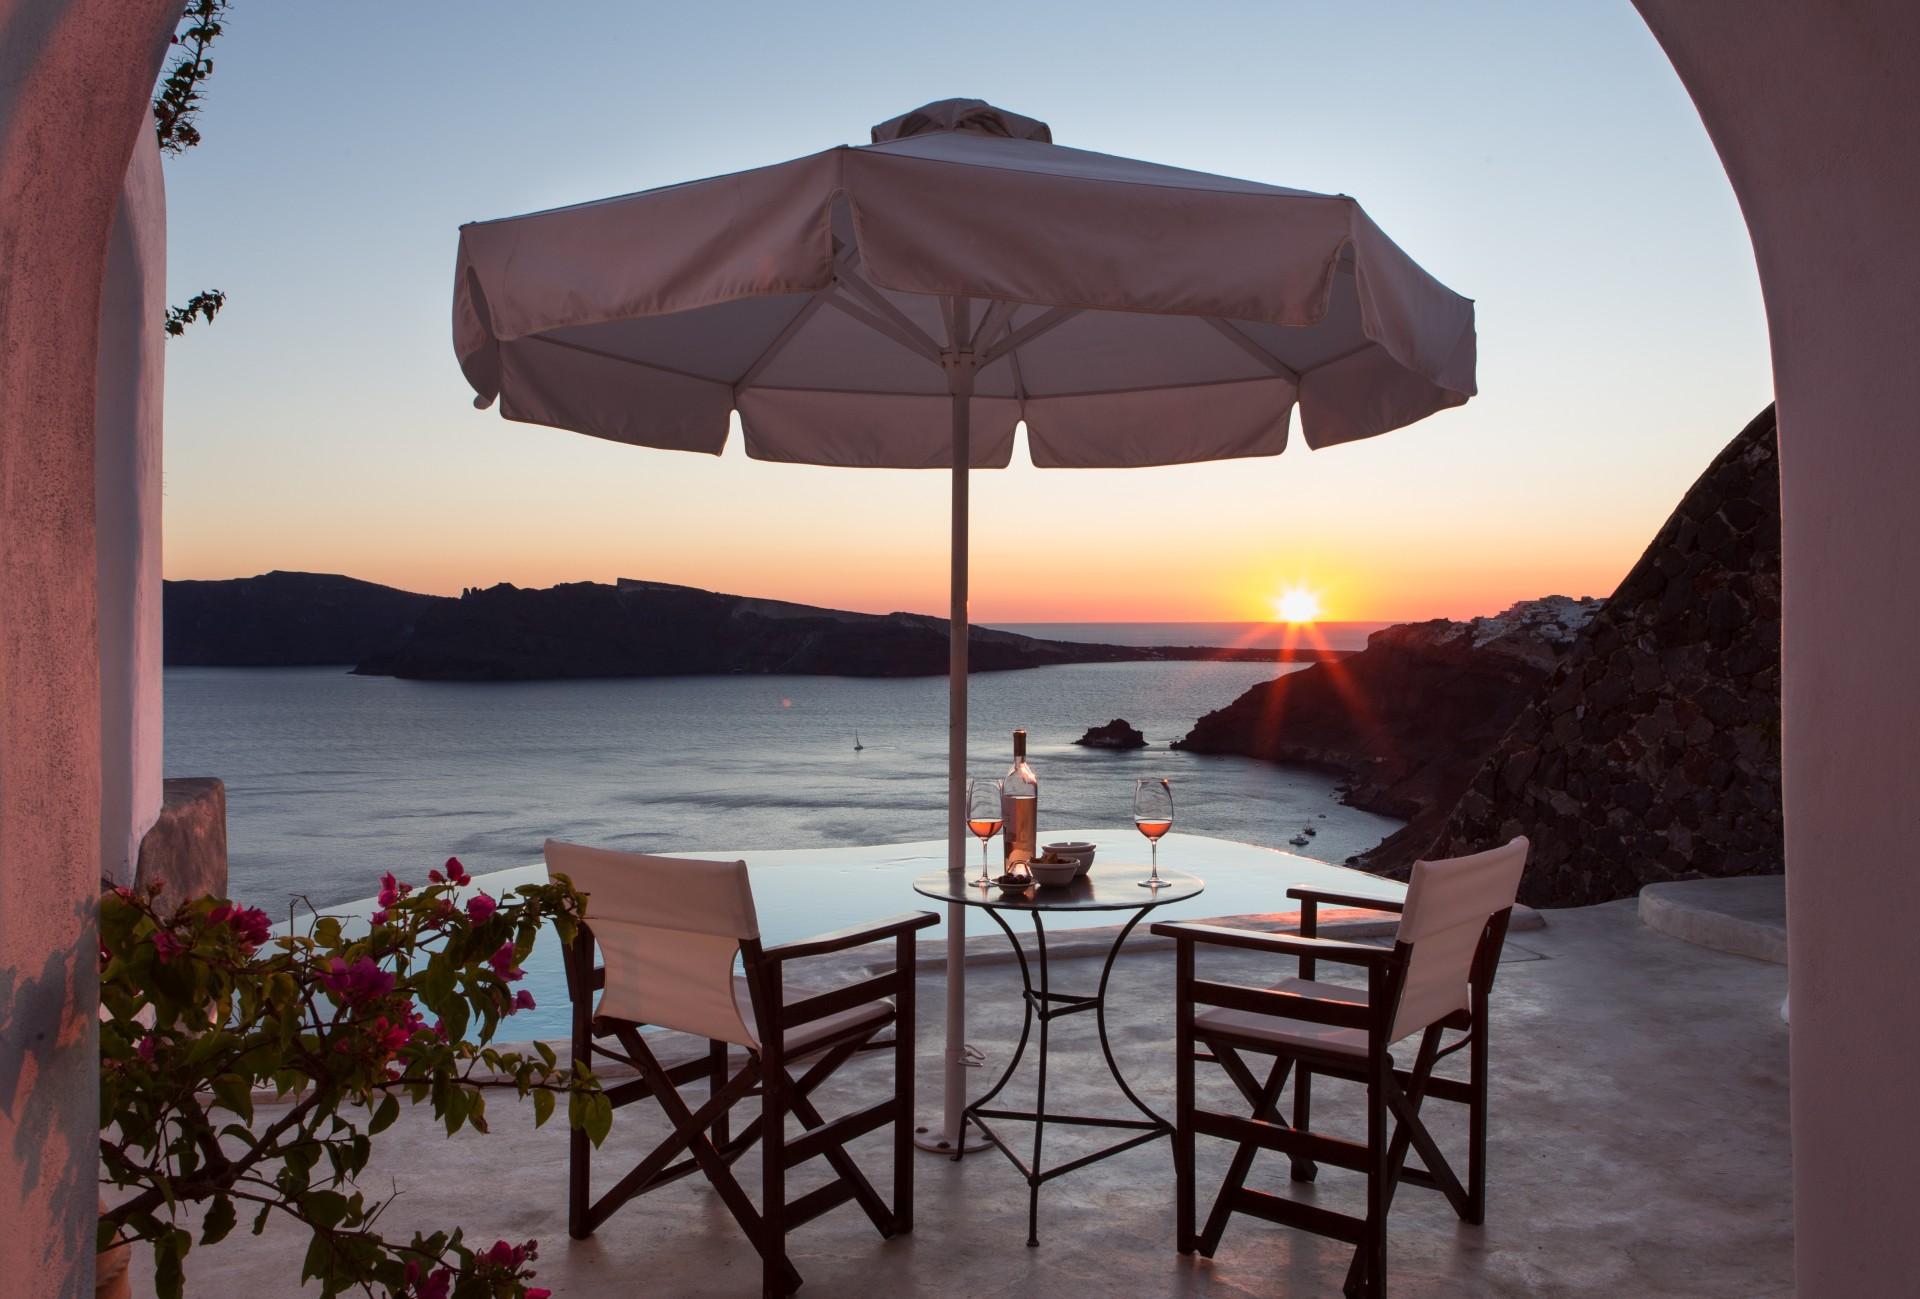 Terrasse der Deluxe Suite mit Pool und Meerblick